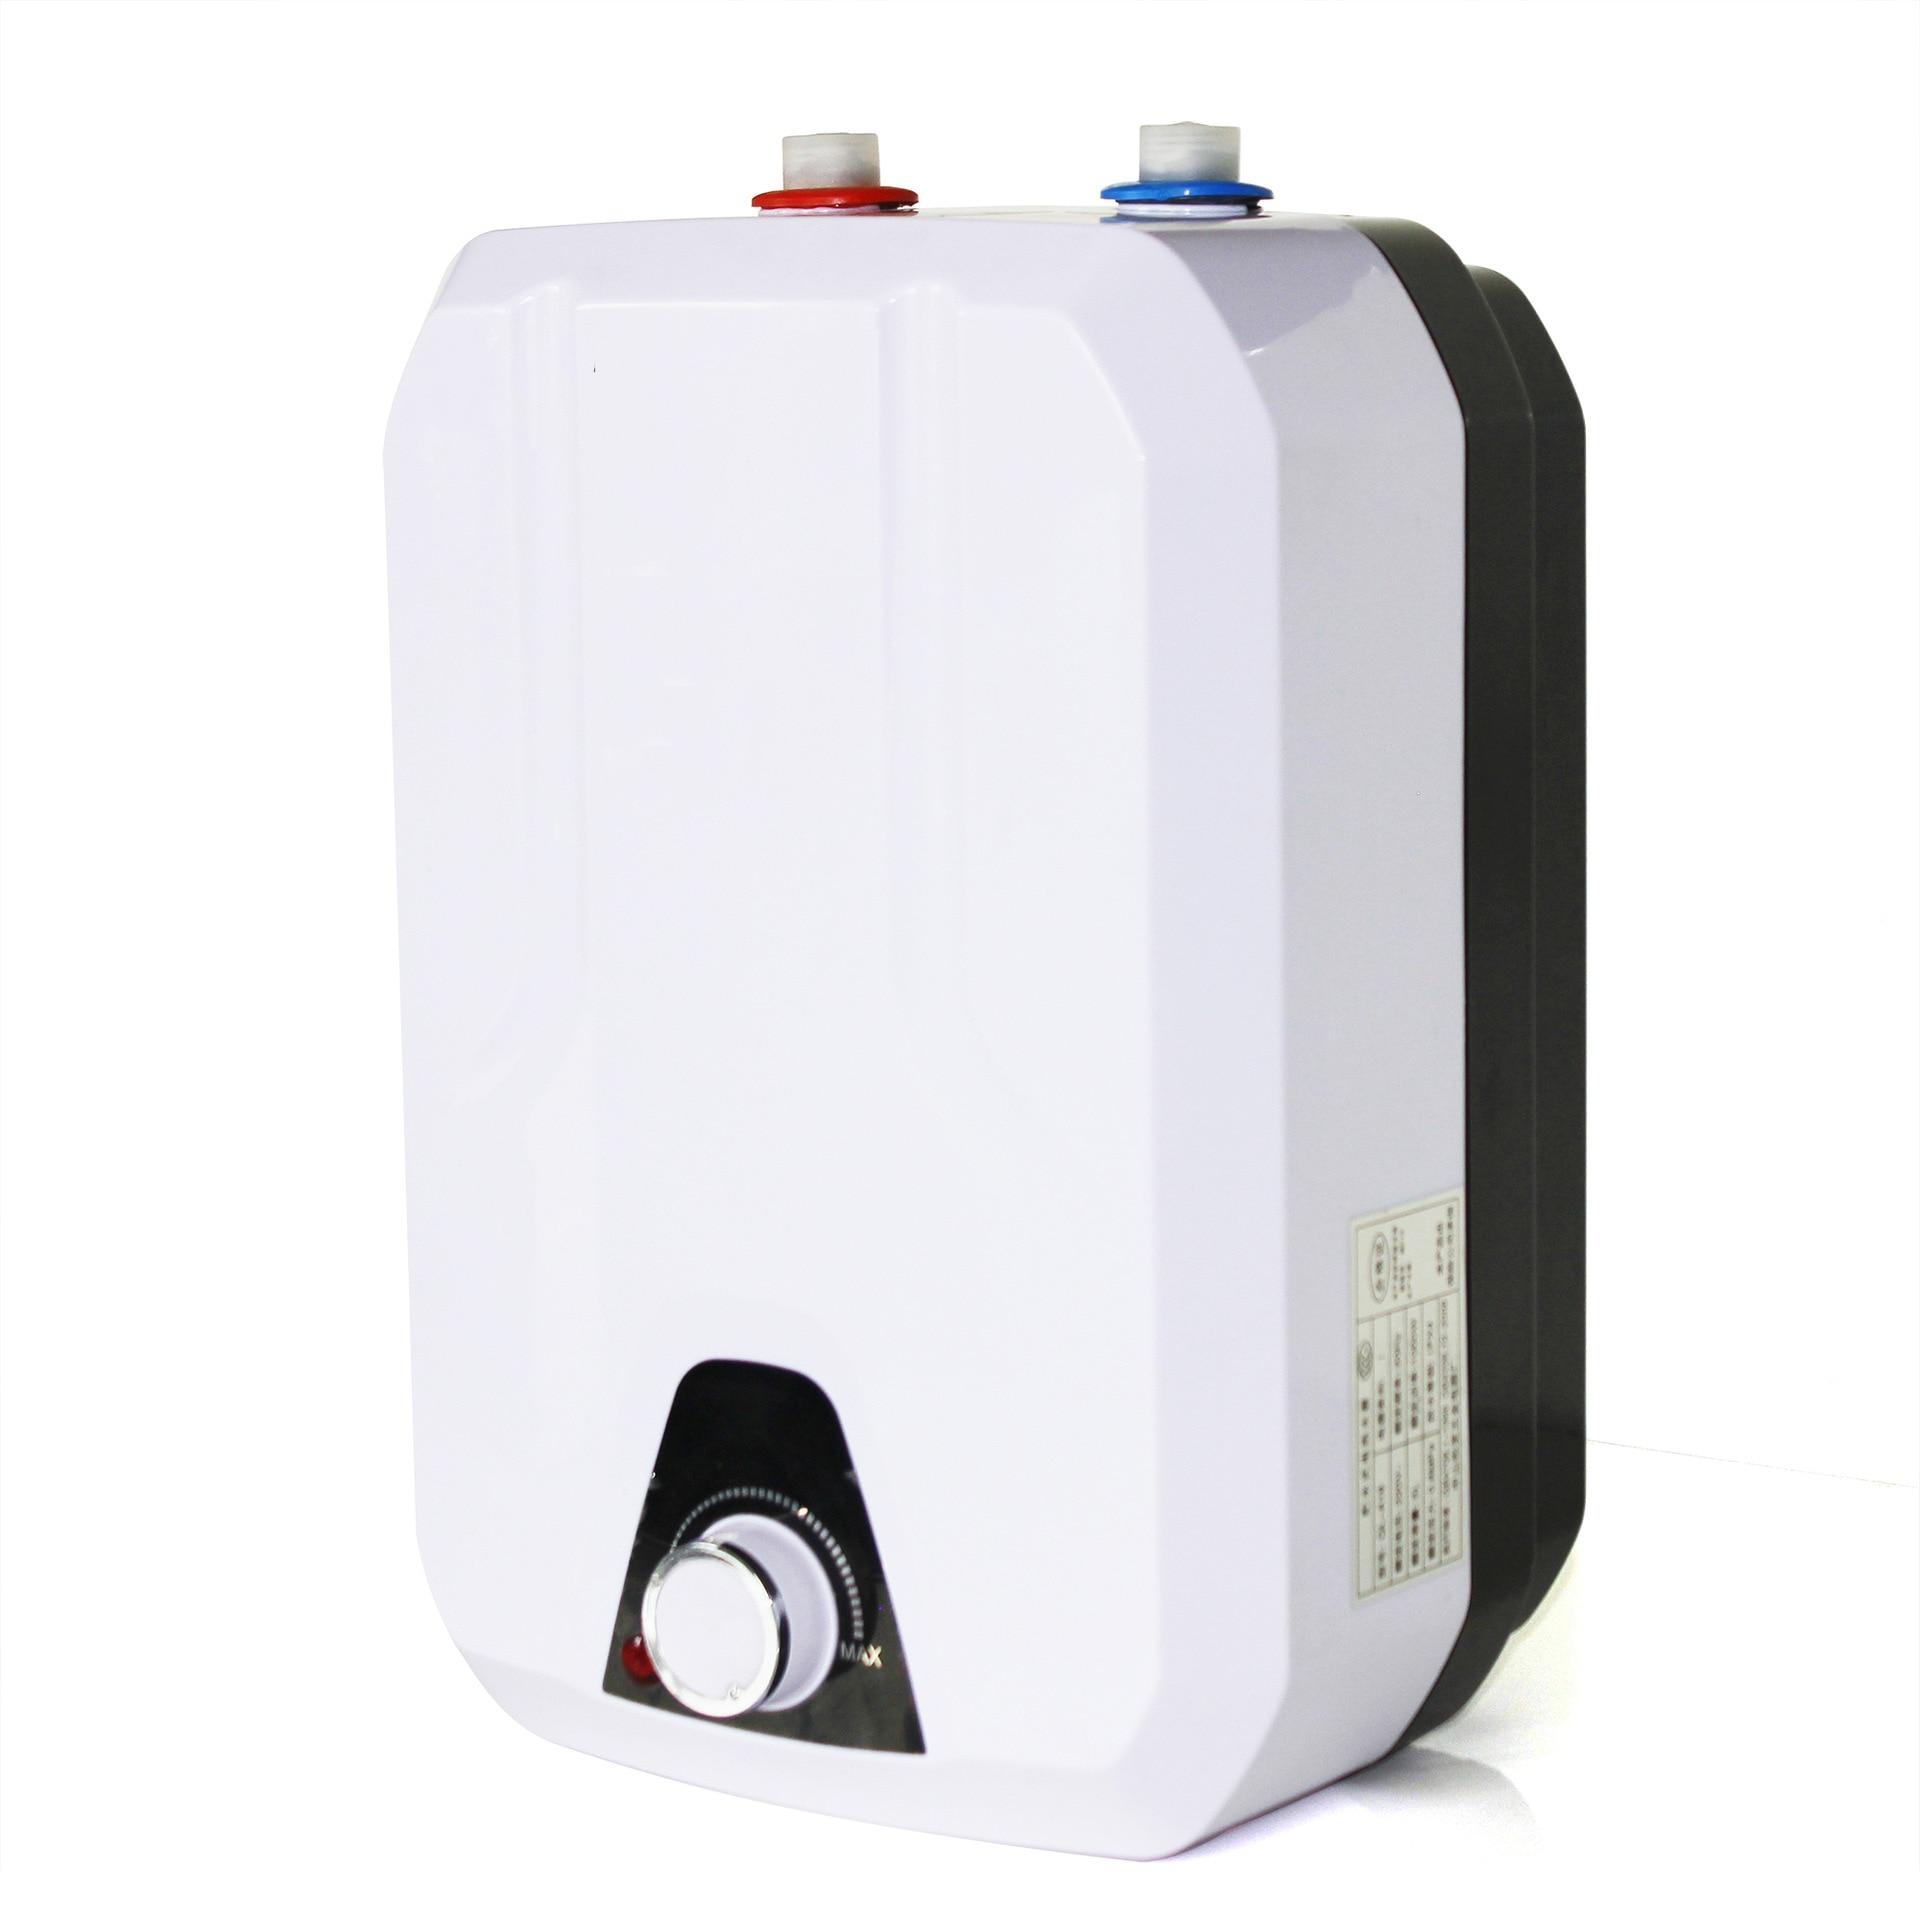 DSZF-A18,Kitchen Water Heater ,Small Kitchen Treasure Kitchen Special Water Storage-Po 1500 W